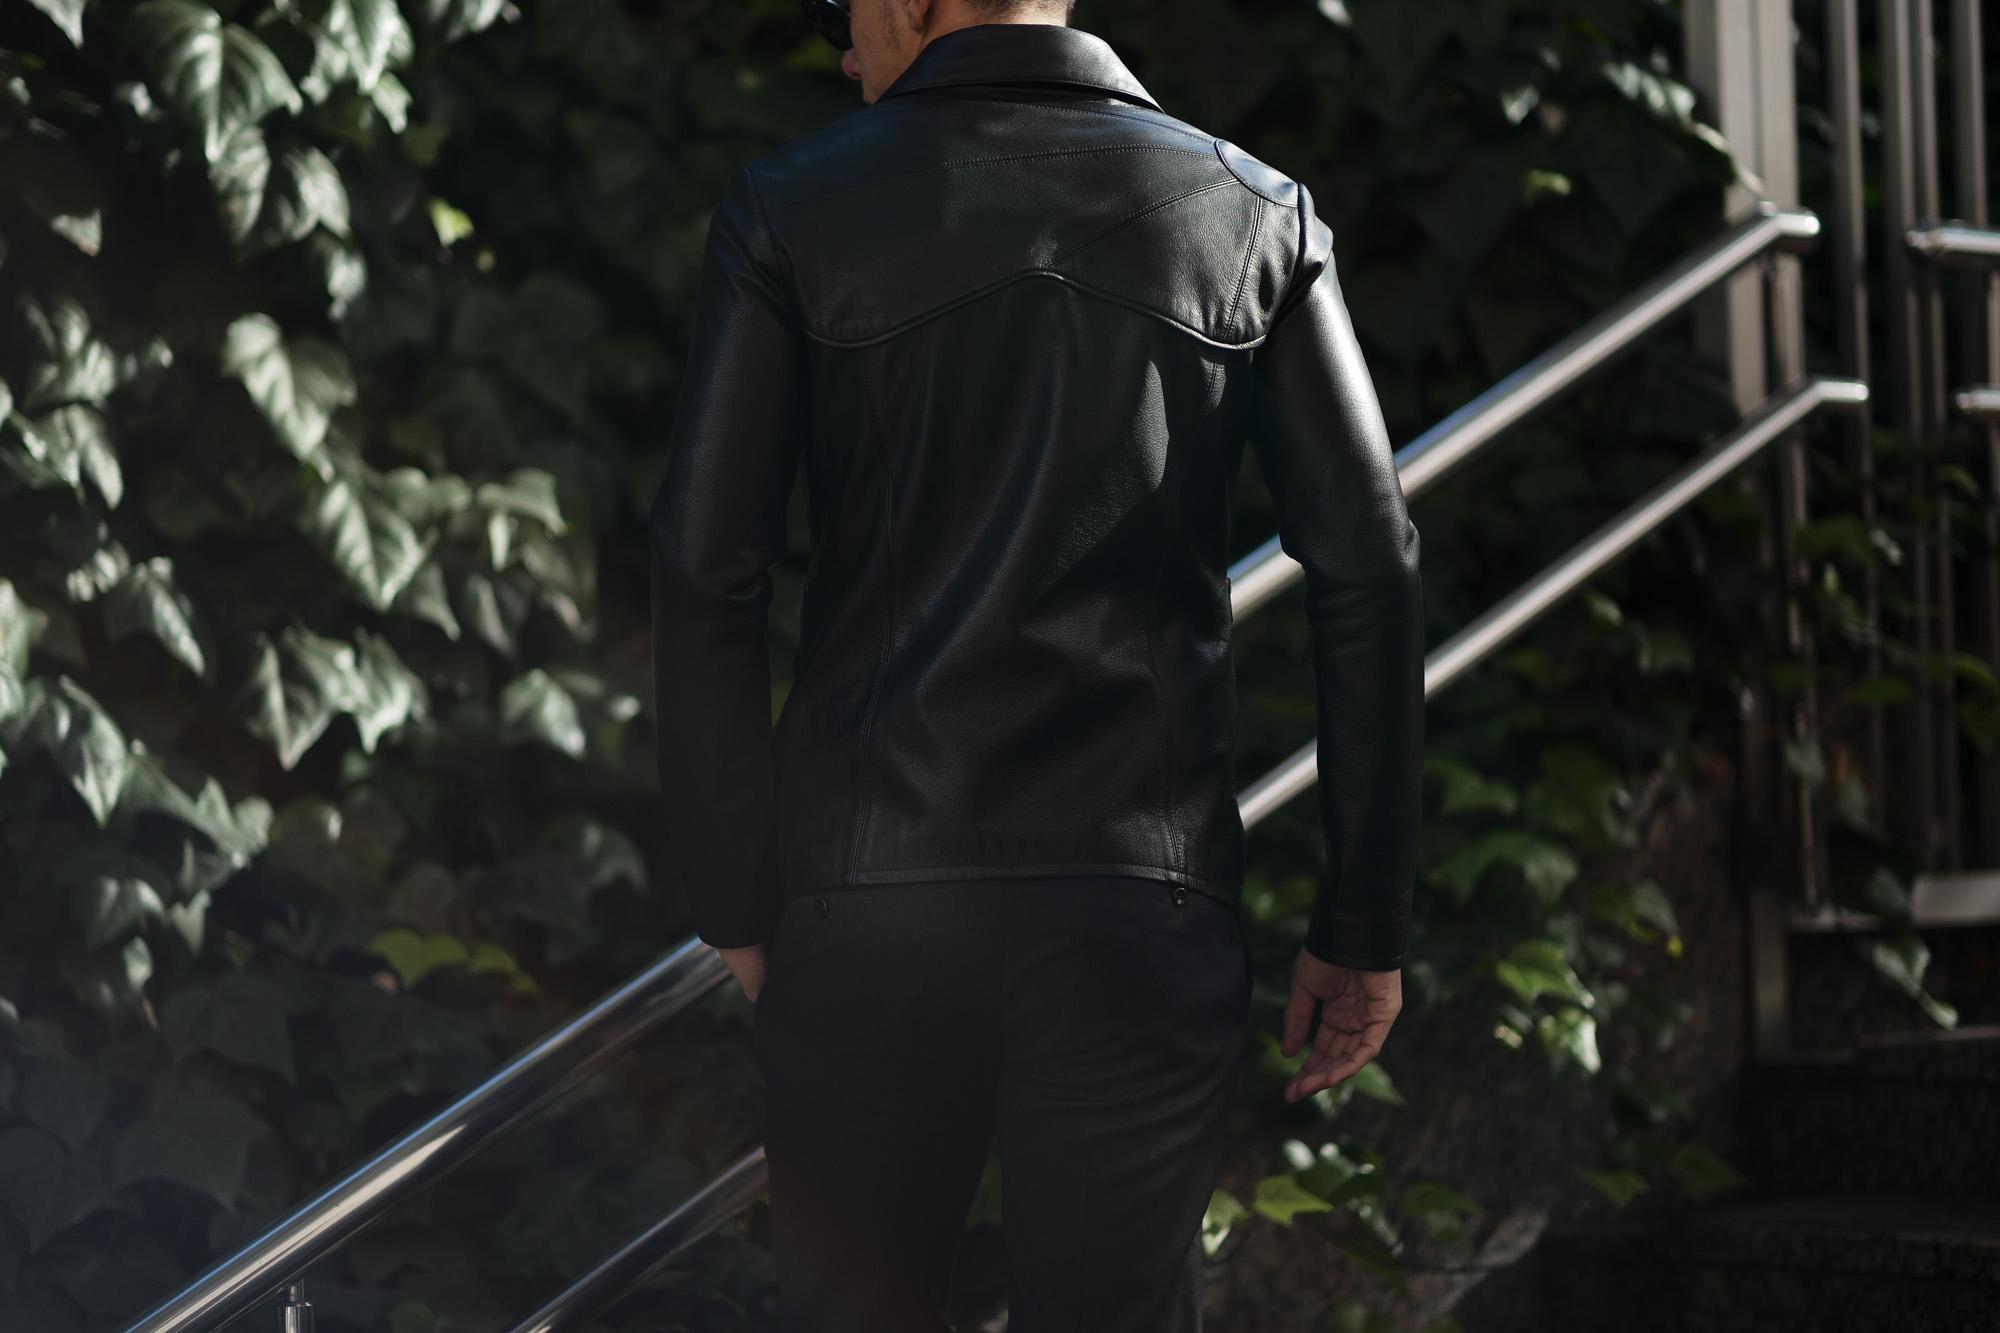 Cuervo (クエルボ) Satisfaction Leather Collection (サティスファクション レザー コレクション) East West(イーストウエスト)  SMOKE(スモーク) BUFFALO LEATHER (バッファロー レザー) レザージャケット BLACK(ブラック) MADE IN JAPAN (日本製) 2019 春夏 【ご予約受付中】 愛知 名古屋 東京 大阪  altoediritto アルトエデリット 洋服屋 レザージャケット サウスパラディソ eastwes